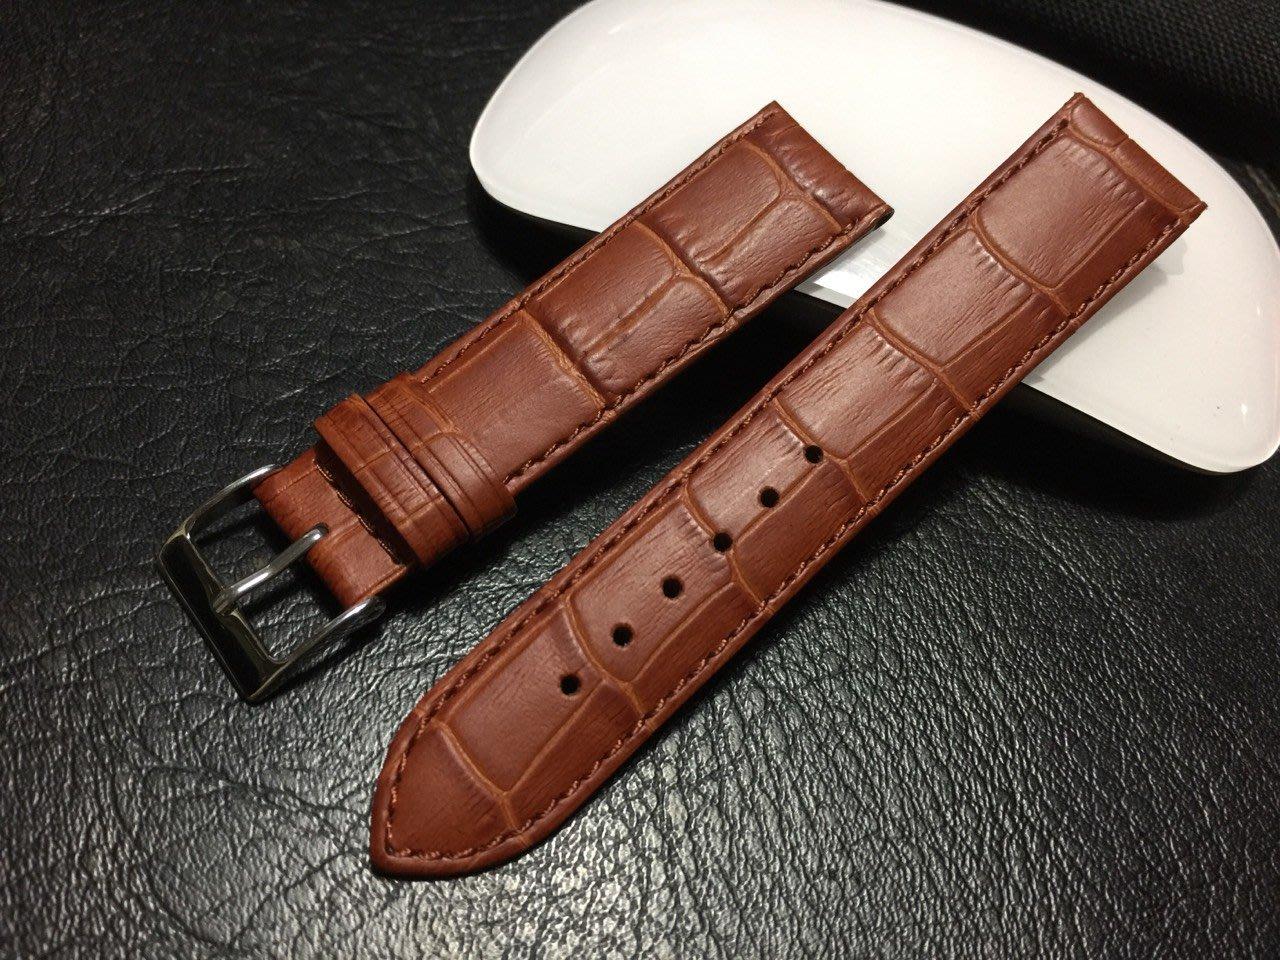 20mm棕色 防水 進口皮料啞光高質感替代oris ck armani seiko原廠錶帶真皮製錶帶